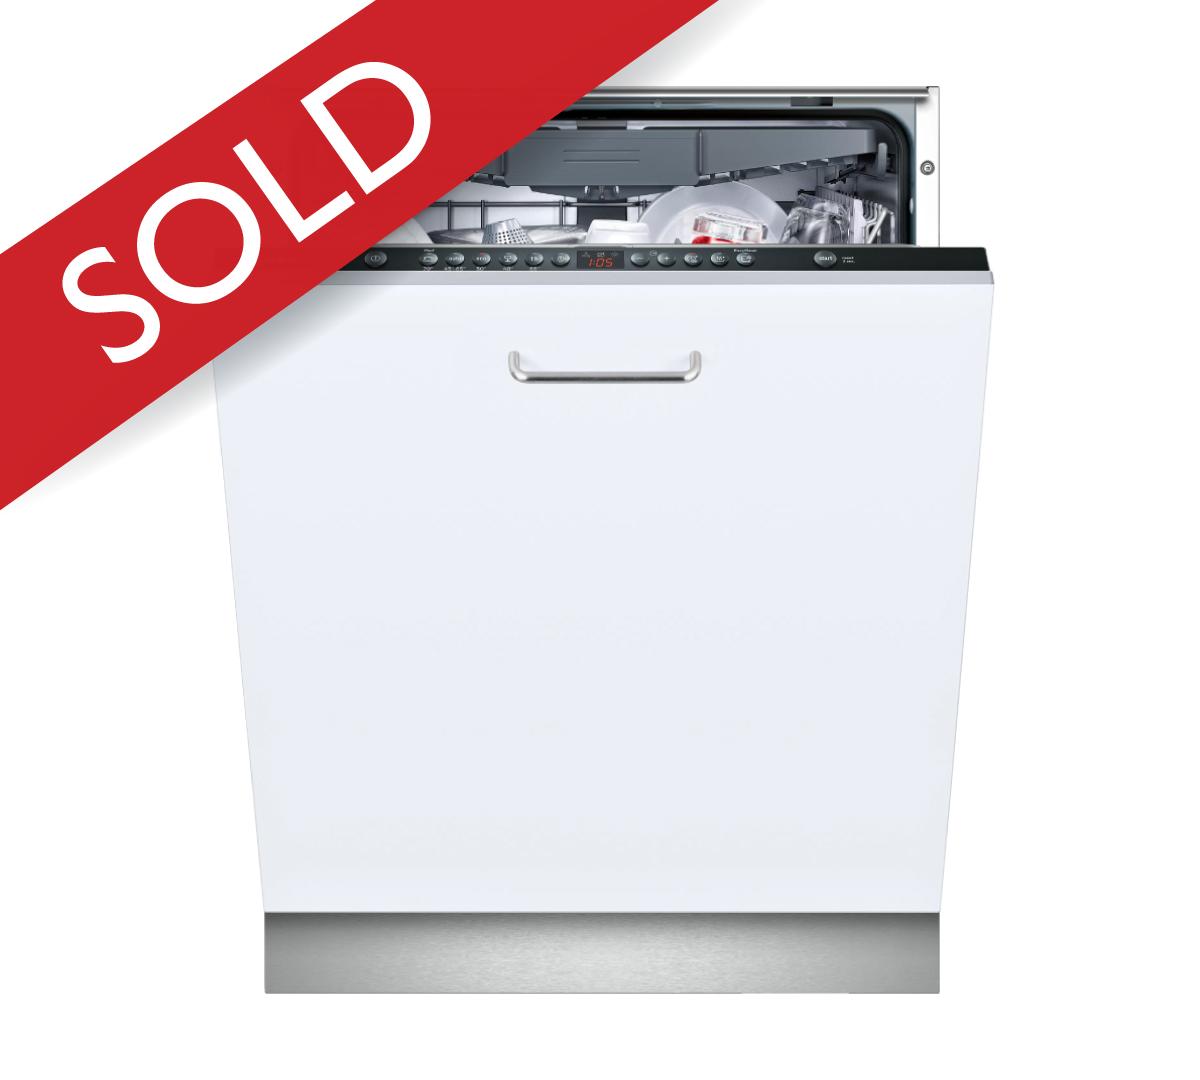 N70Fully-integrated dishwasher60cm